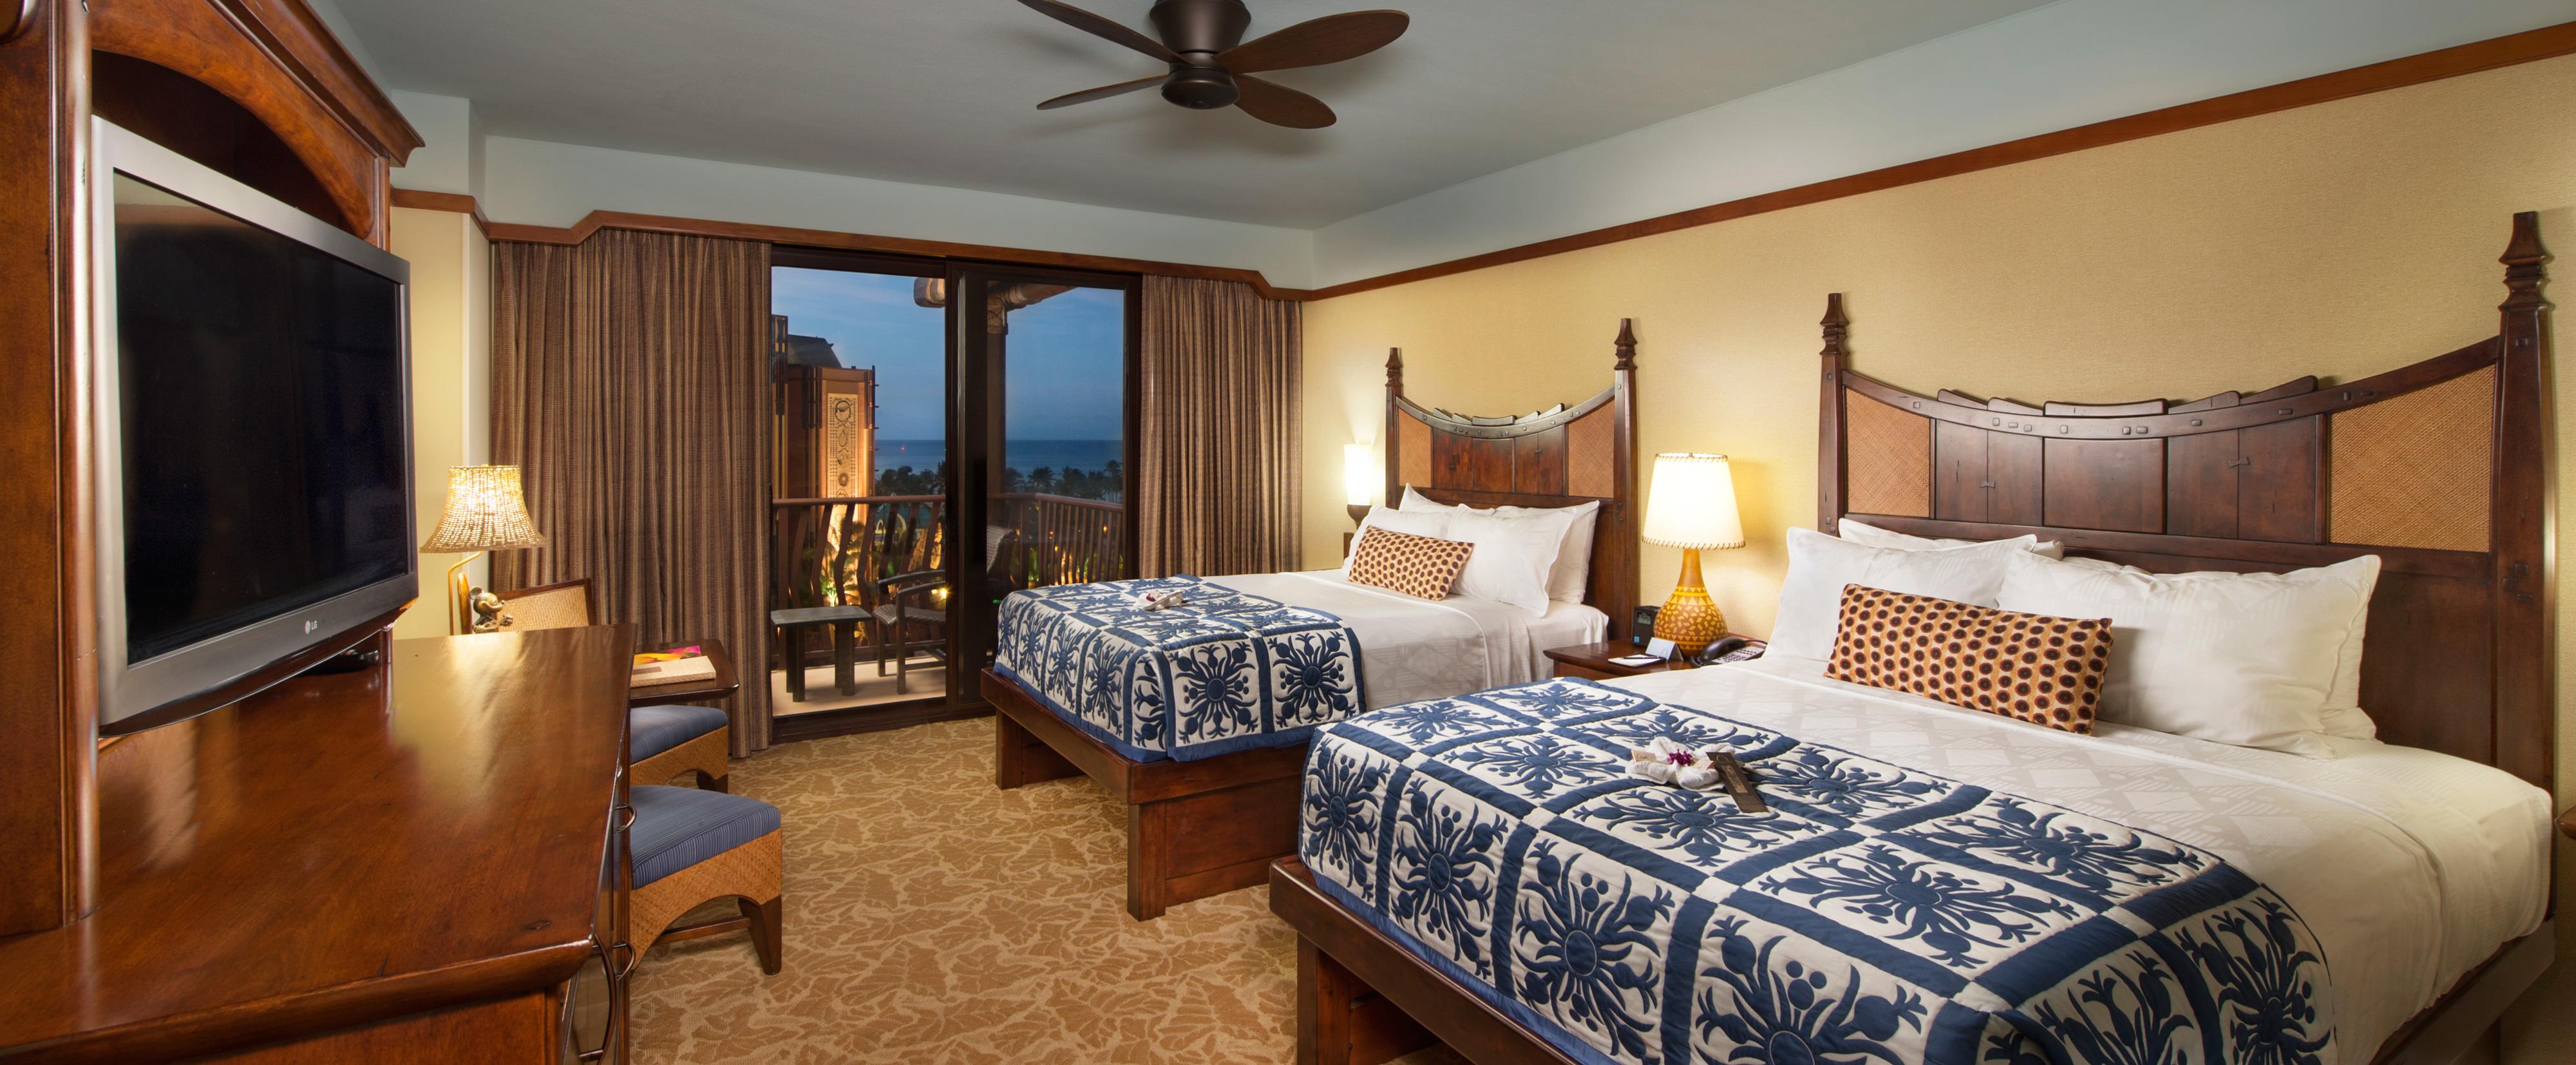 queen sleeper sofa rooms to go small corner sofas standard hotel | aulani hawaii resort & spa